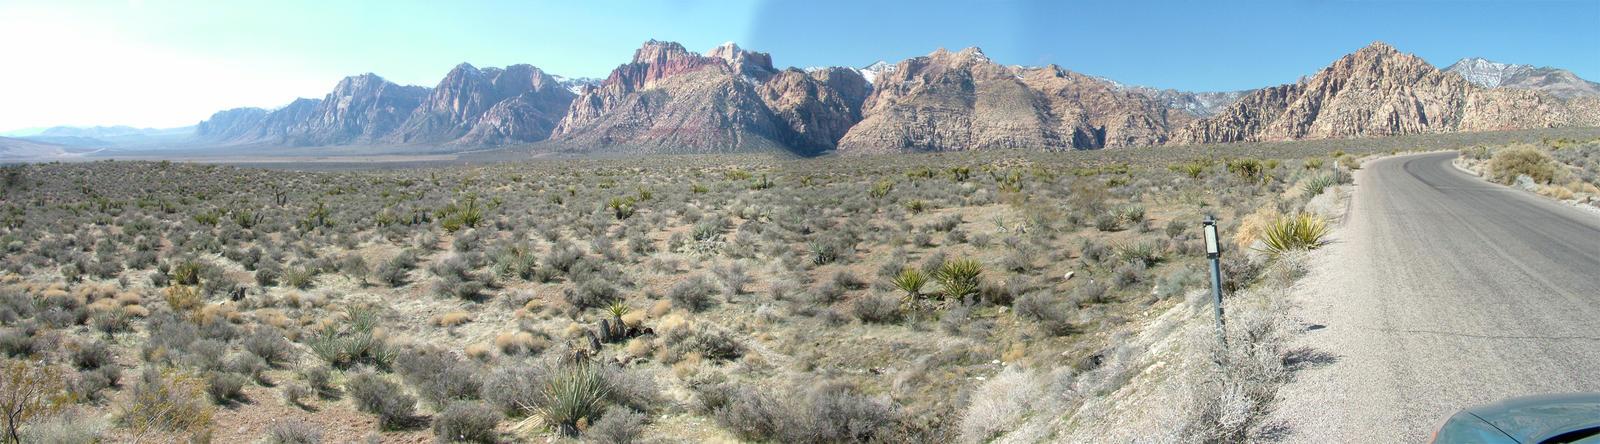 Red Rock Canyon Pano by mackdj